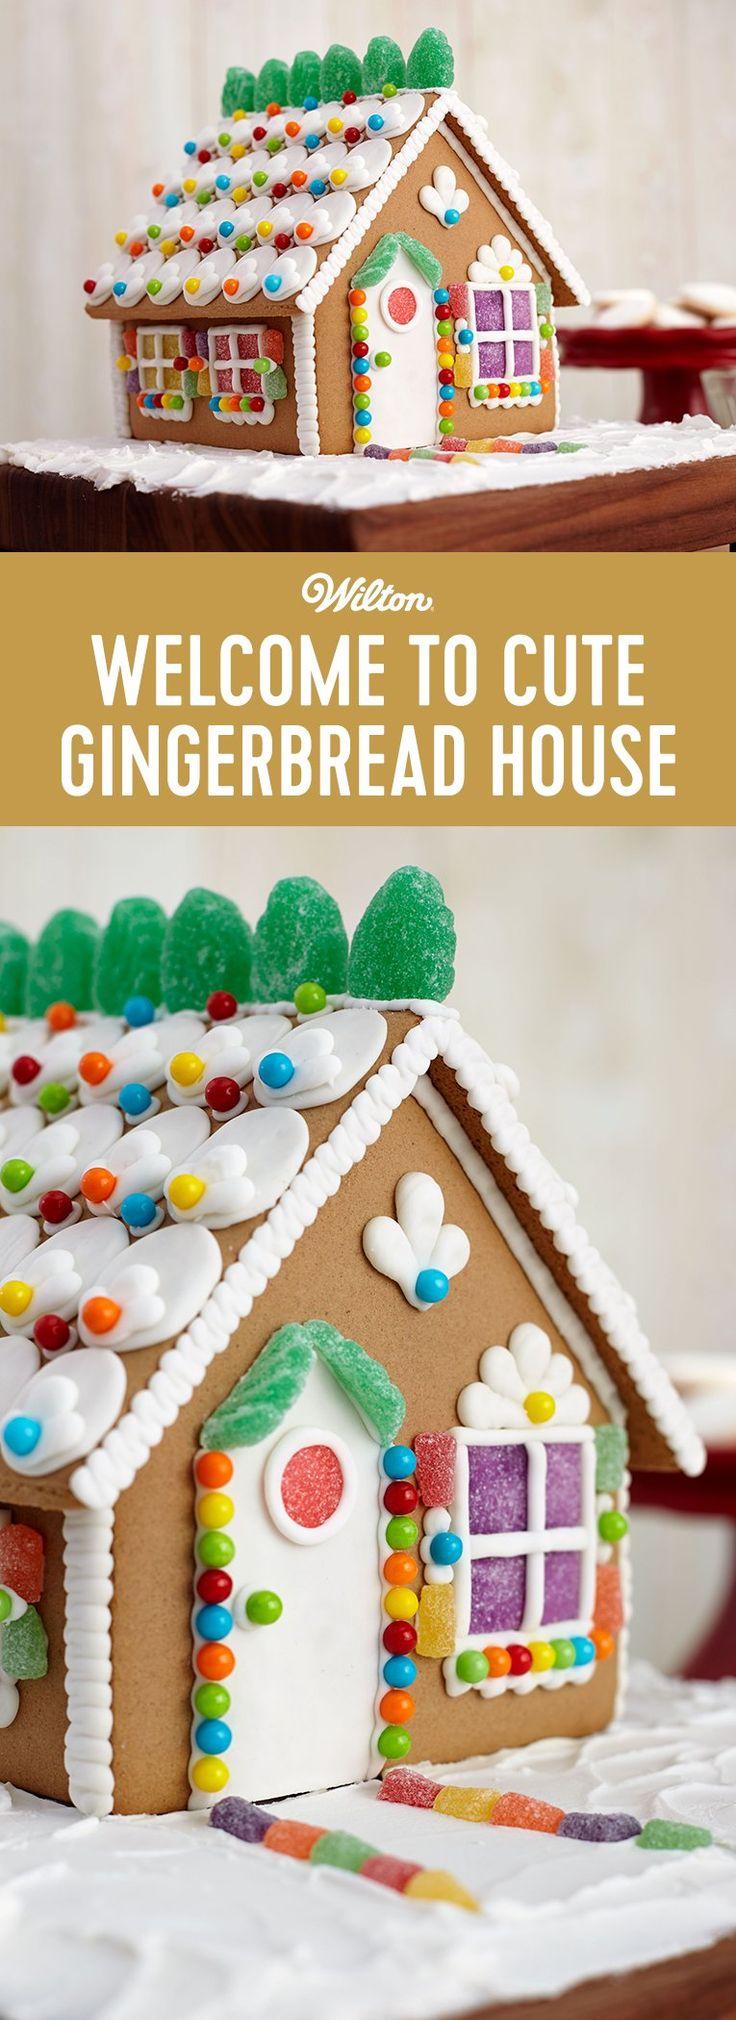 Best 25 Gingerbread Houses Ideas On Pinterest Christmas